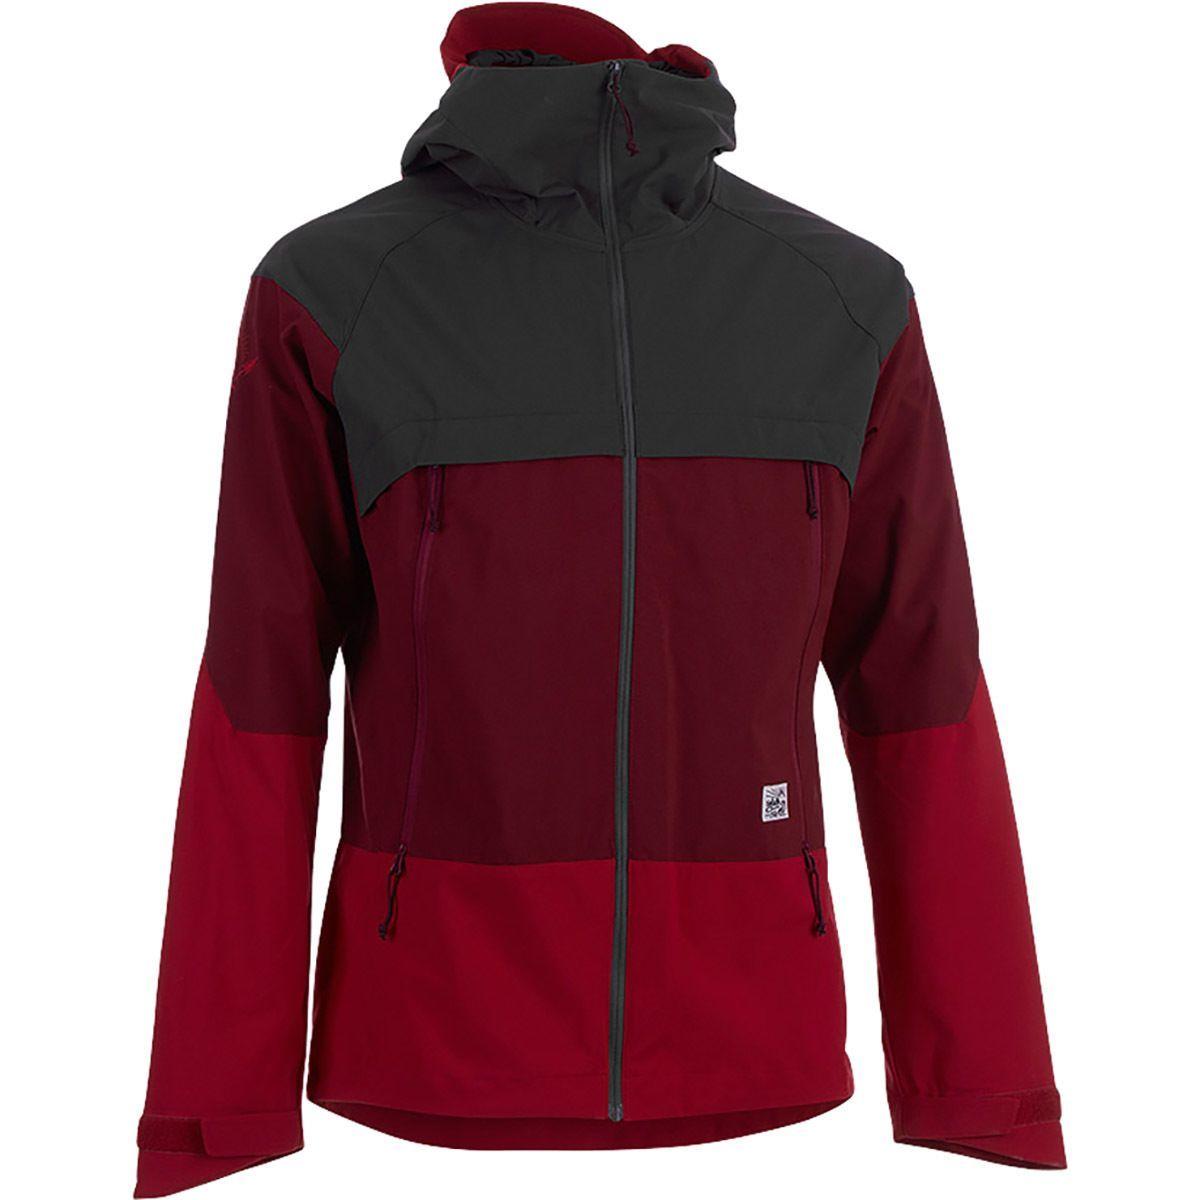 Maloja BeaverM Softshell Jacket - Men's